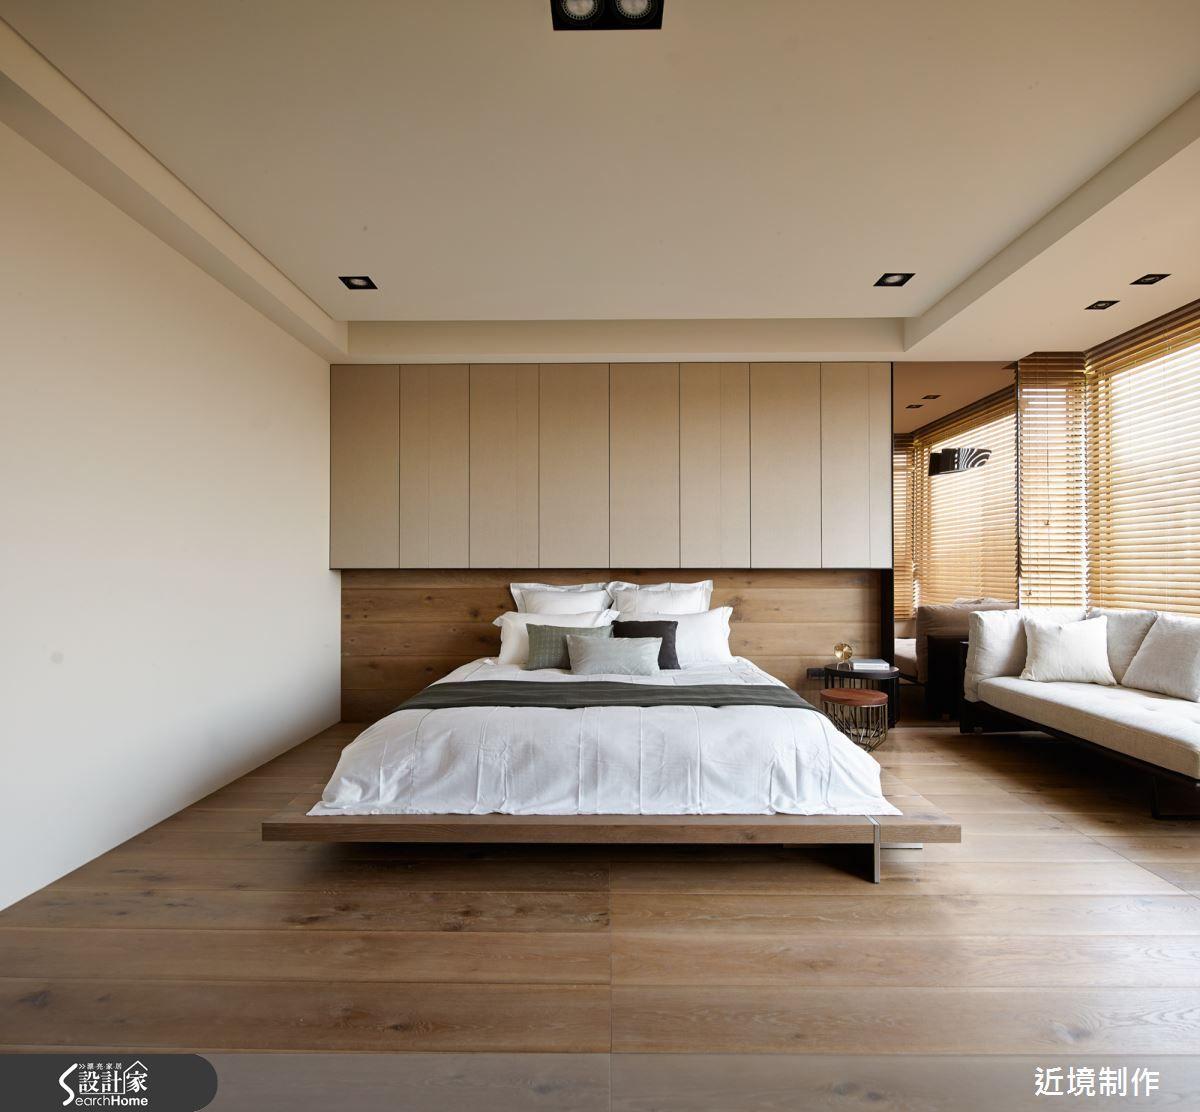 5 room hdb master bedroom design  現代風的裝潢圖片為近境制作的設計作品該設計案例是一間無總坪數為